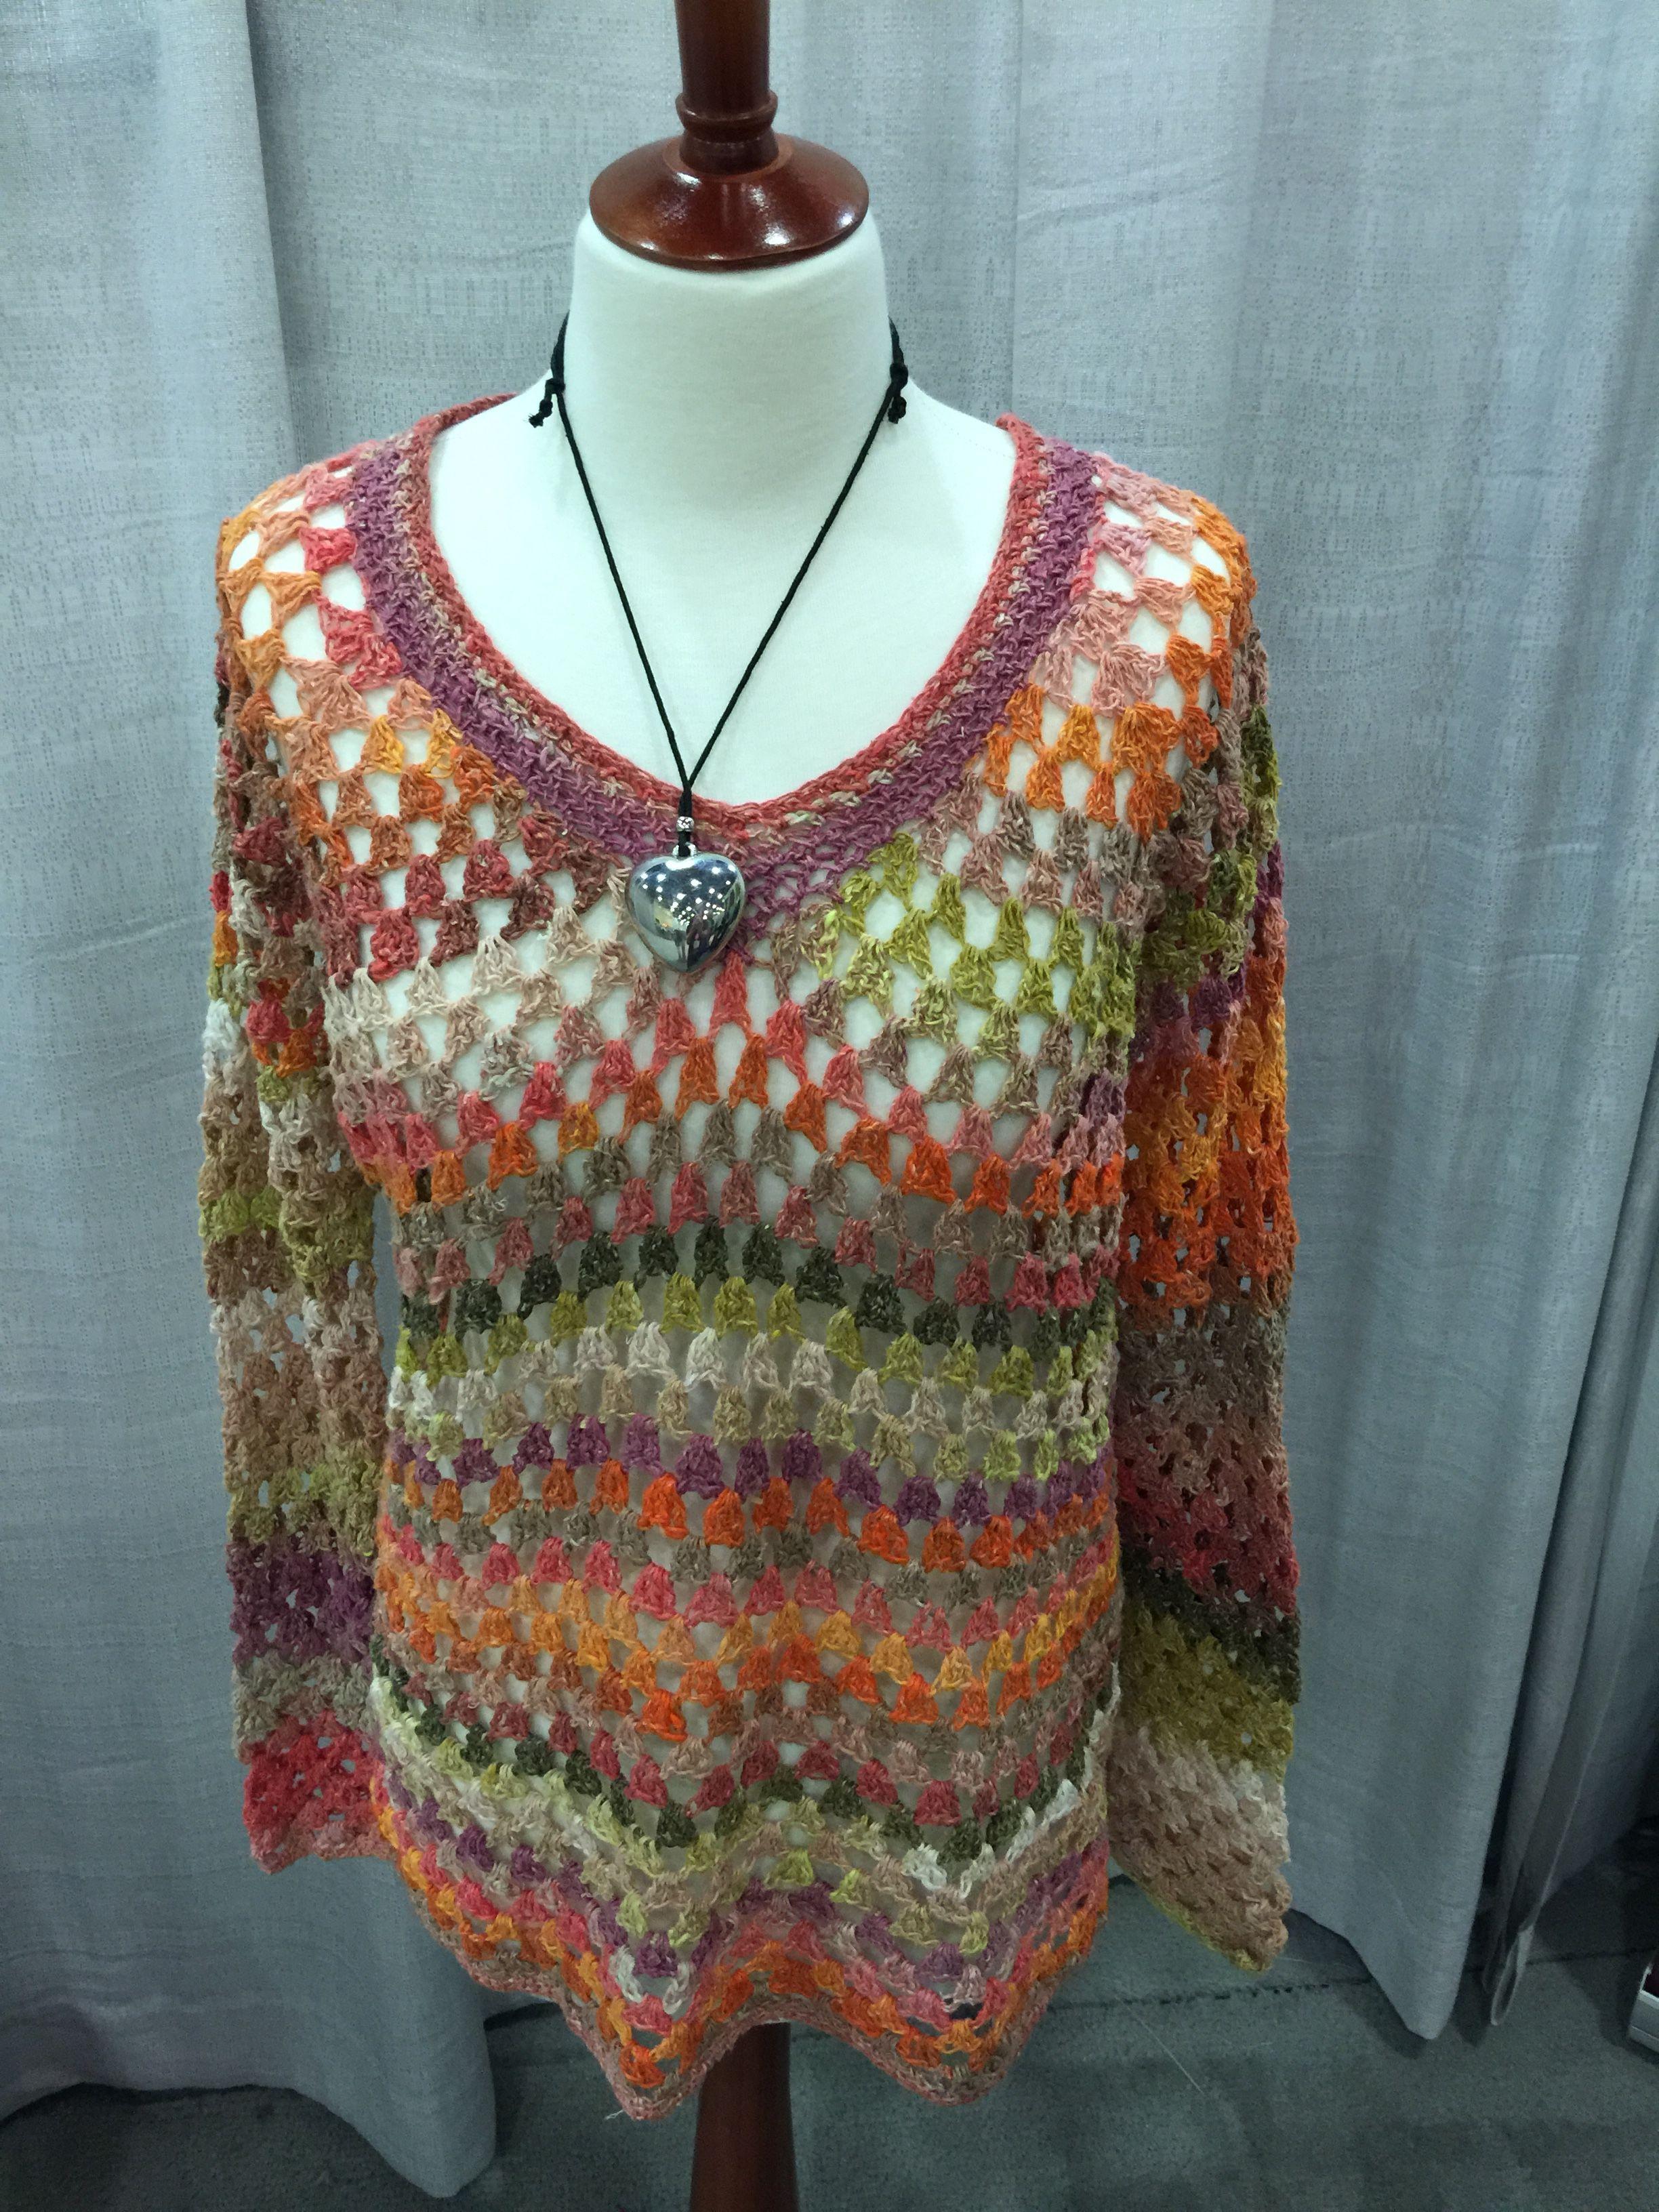 Noro Yarn Patterns Magnificent Design Ideas